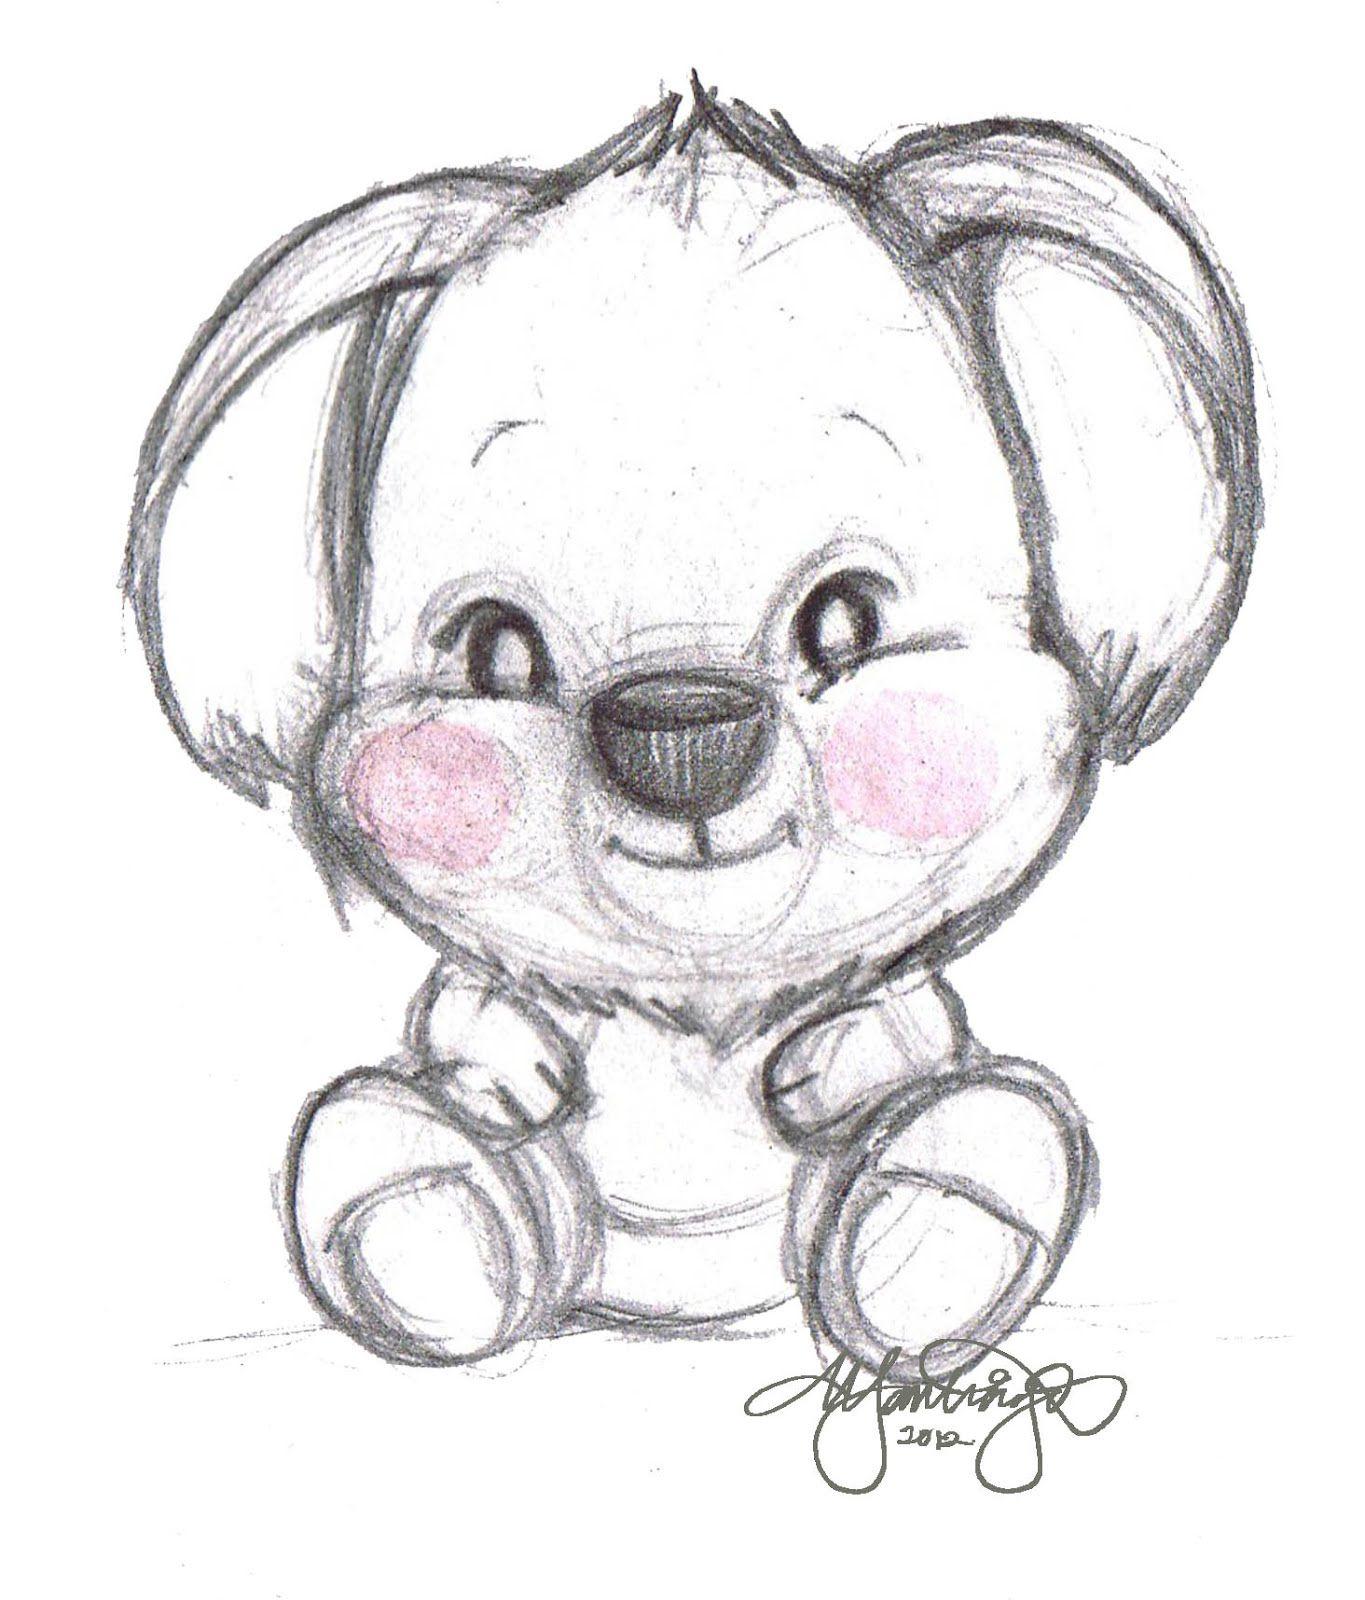 DRAW ME THE CUTEST KOALA BEAR EVER | Freelancer |Cute Baby Koala Leg Drawing